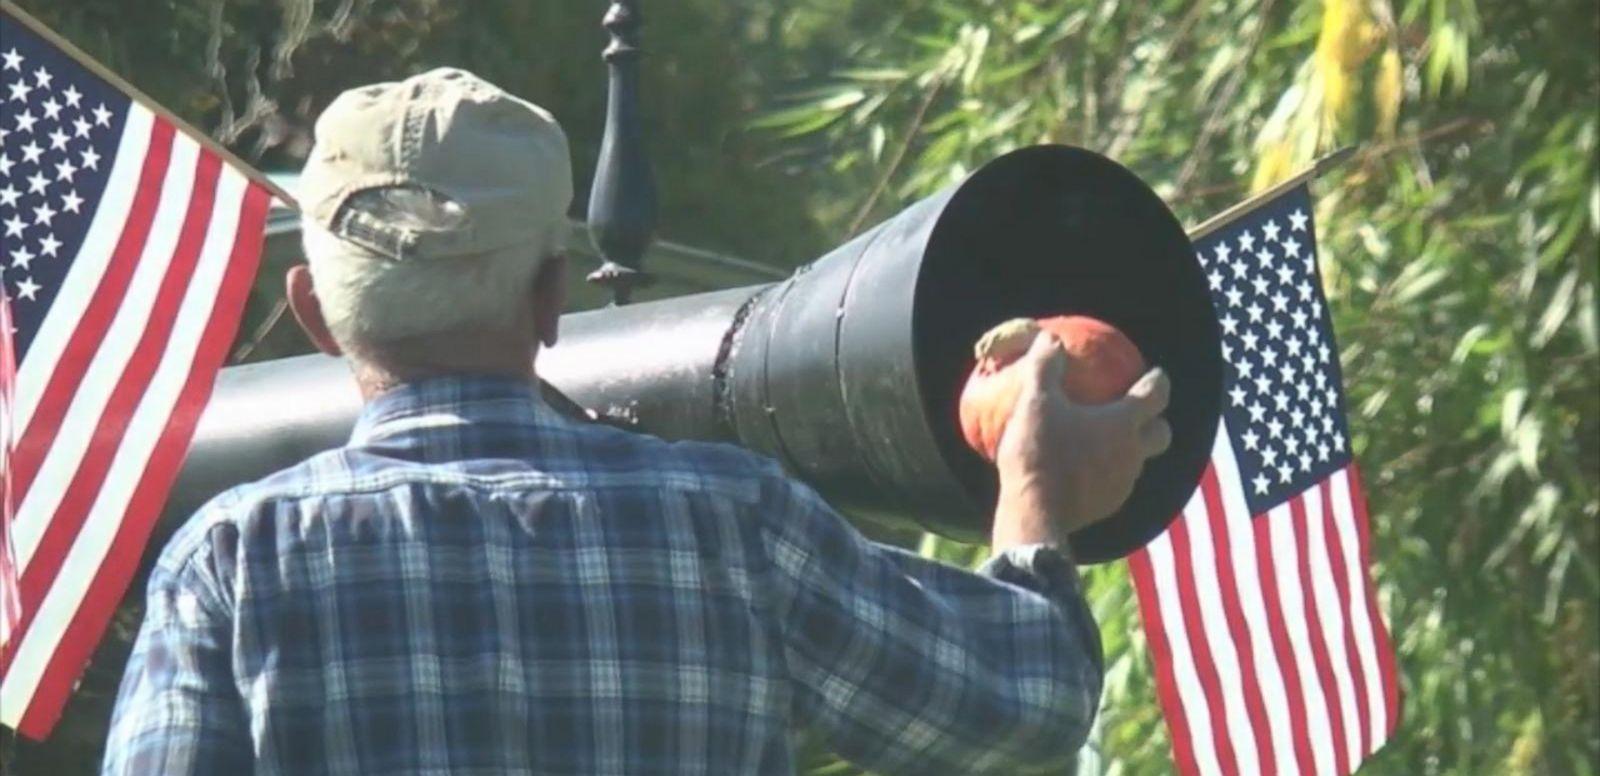 VIDEO: Washington farmer John Thompson says his cannon creations can blast Jack-o-lanterns up to a mile.